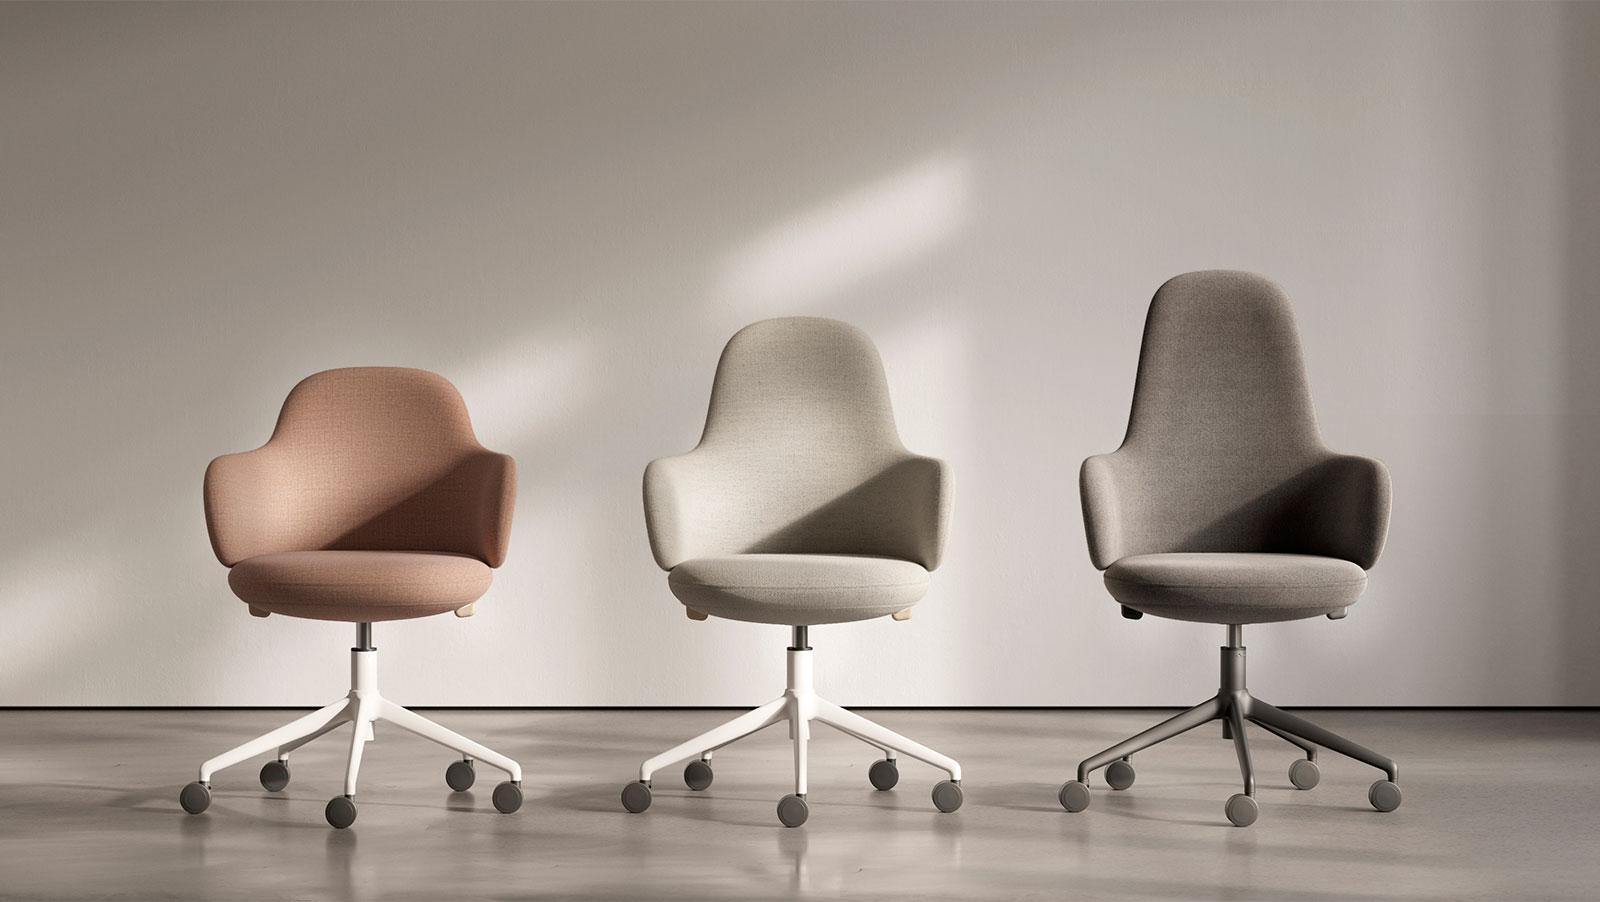 Design-Office-Chair-Lan-Iratzoki-Lizaso-v2